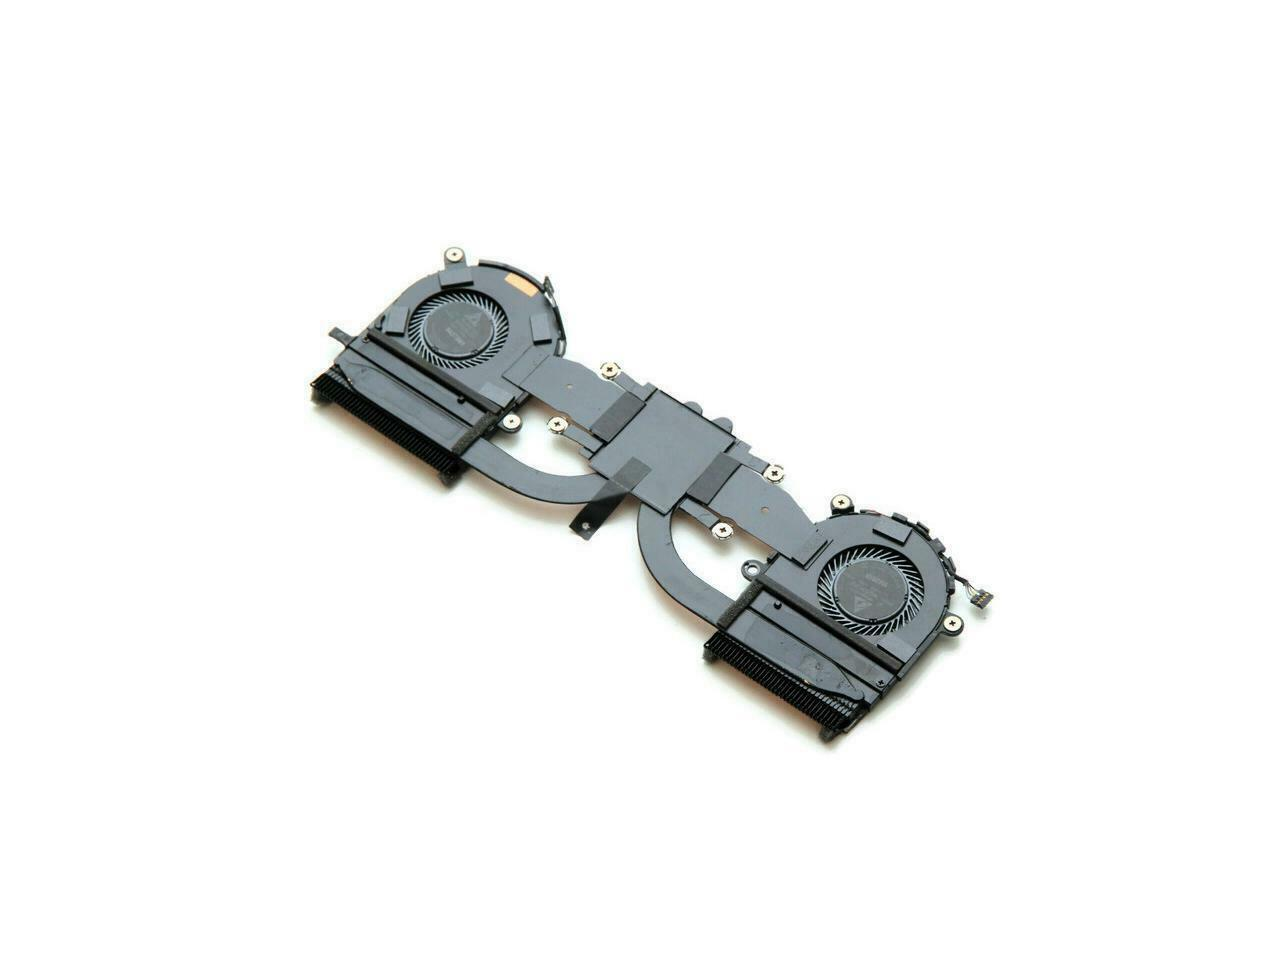 CPU+GPU Cooling Fan for HP Elitebook 1030 X360 G3 L34272-001 P/N:3VY0PTMTP10